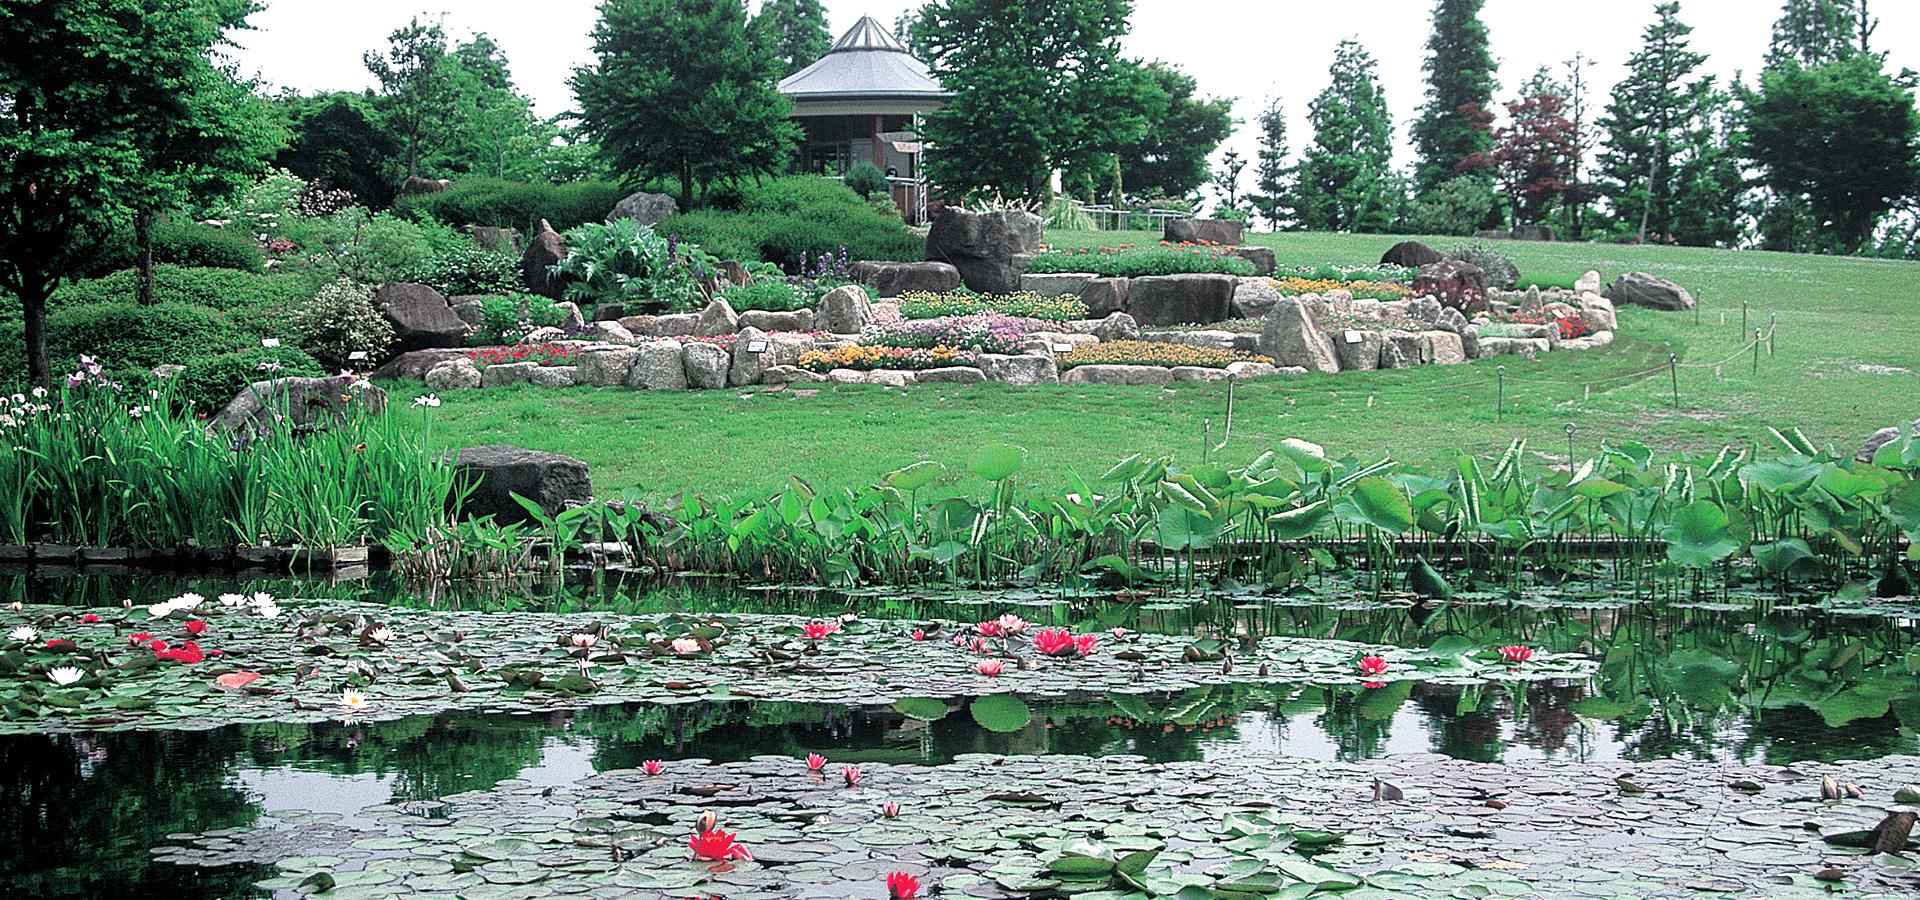 Mizunomori Water Botanical Garden (Kusatsu Aquatic Botanial Garden)